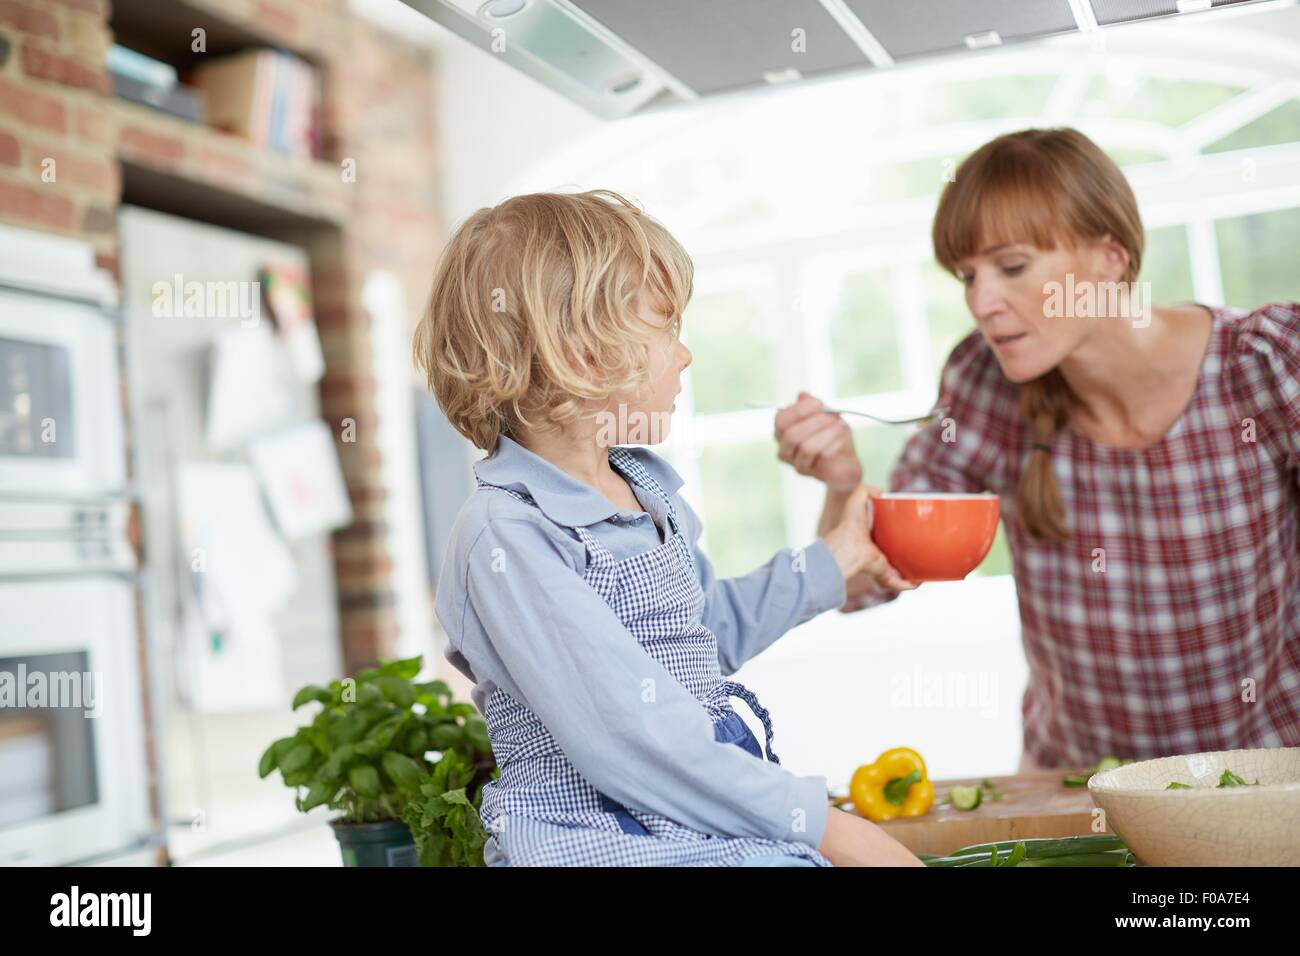 Mère et fils preparing meal in kitchen Photo Stock